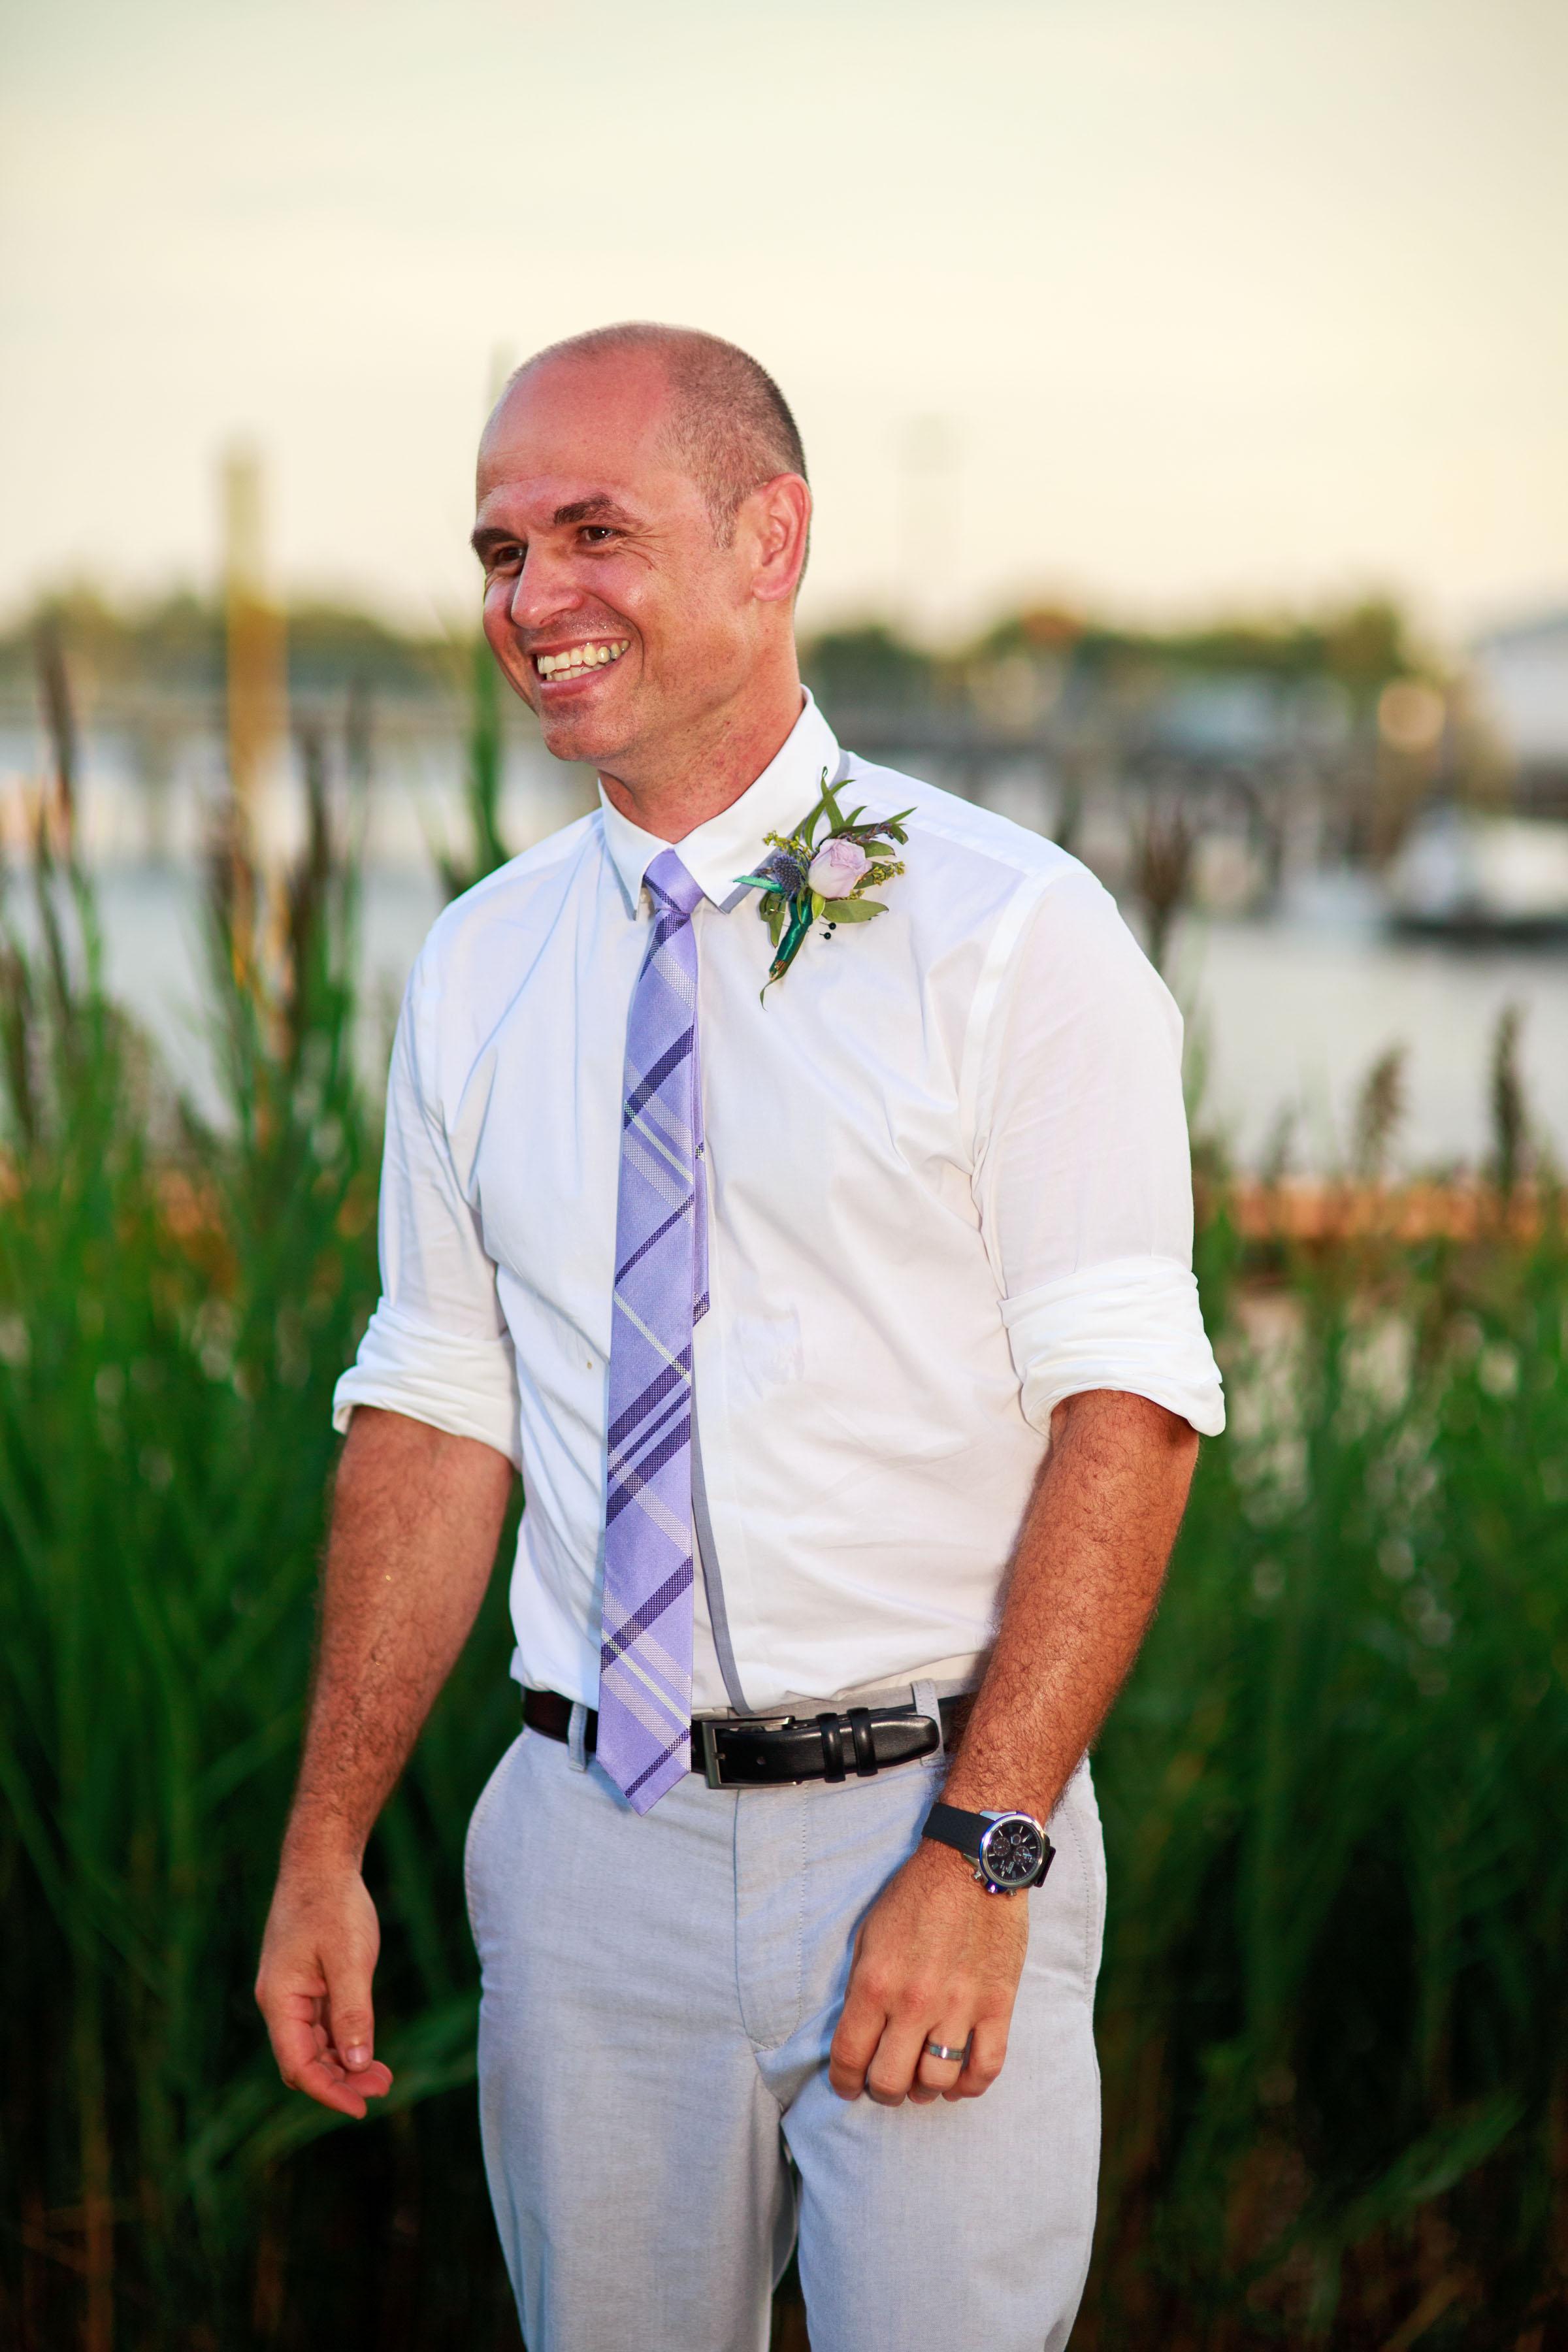 North_Carolina_Wedding_Photographer_Tiffany_Abruzzo_Bride&Groom_34.jpg